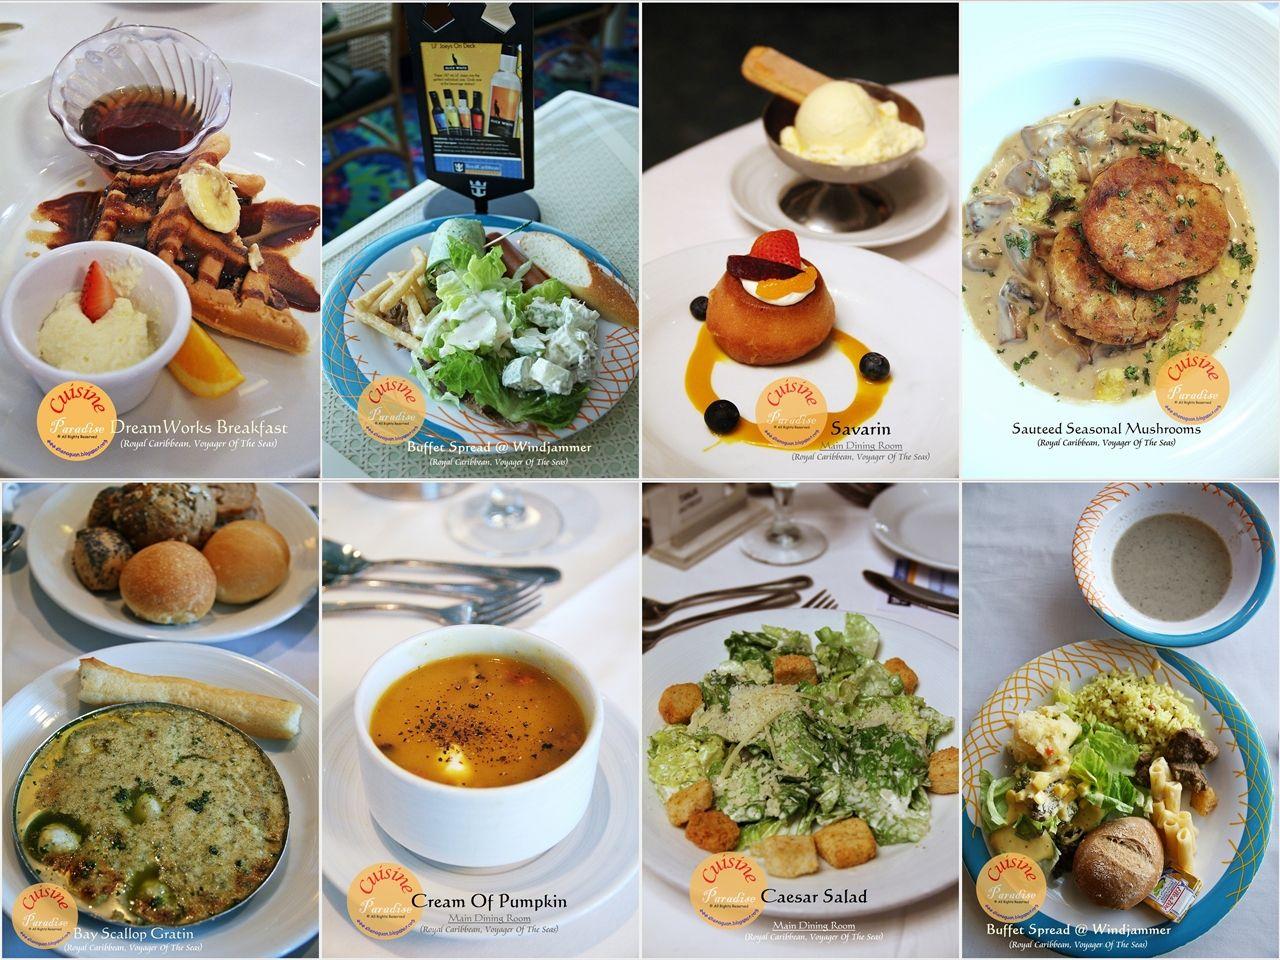 Voyager of the seas royal caribbean international food onboard voyager of the seas royal caribbean international food onboard forumfinder Choice Image